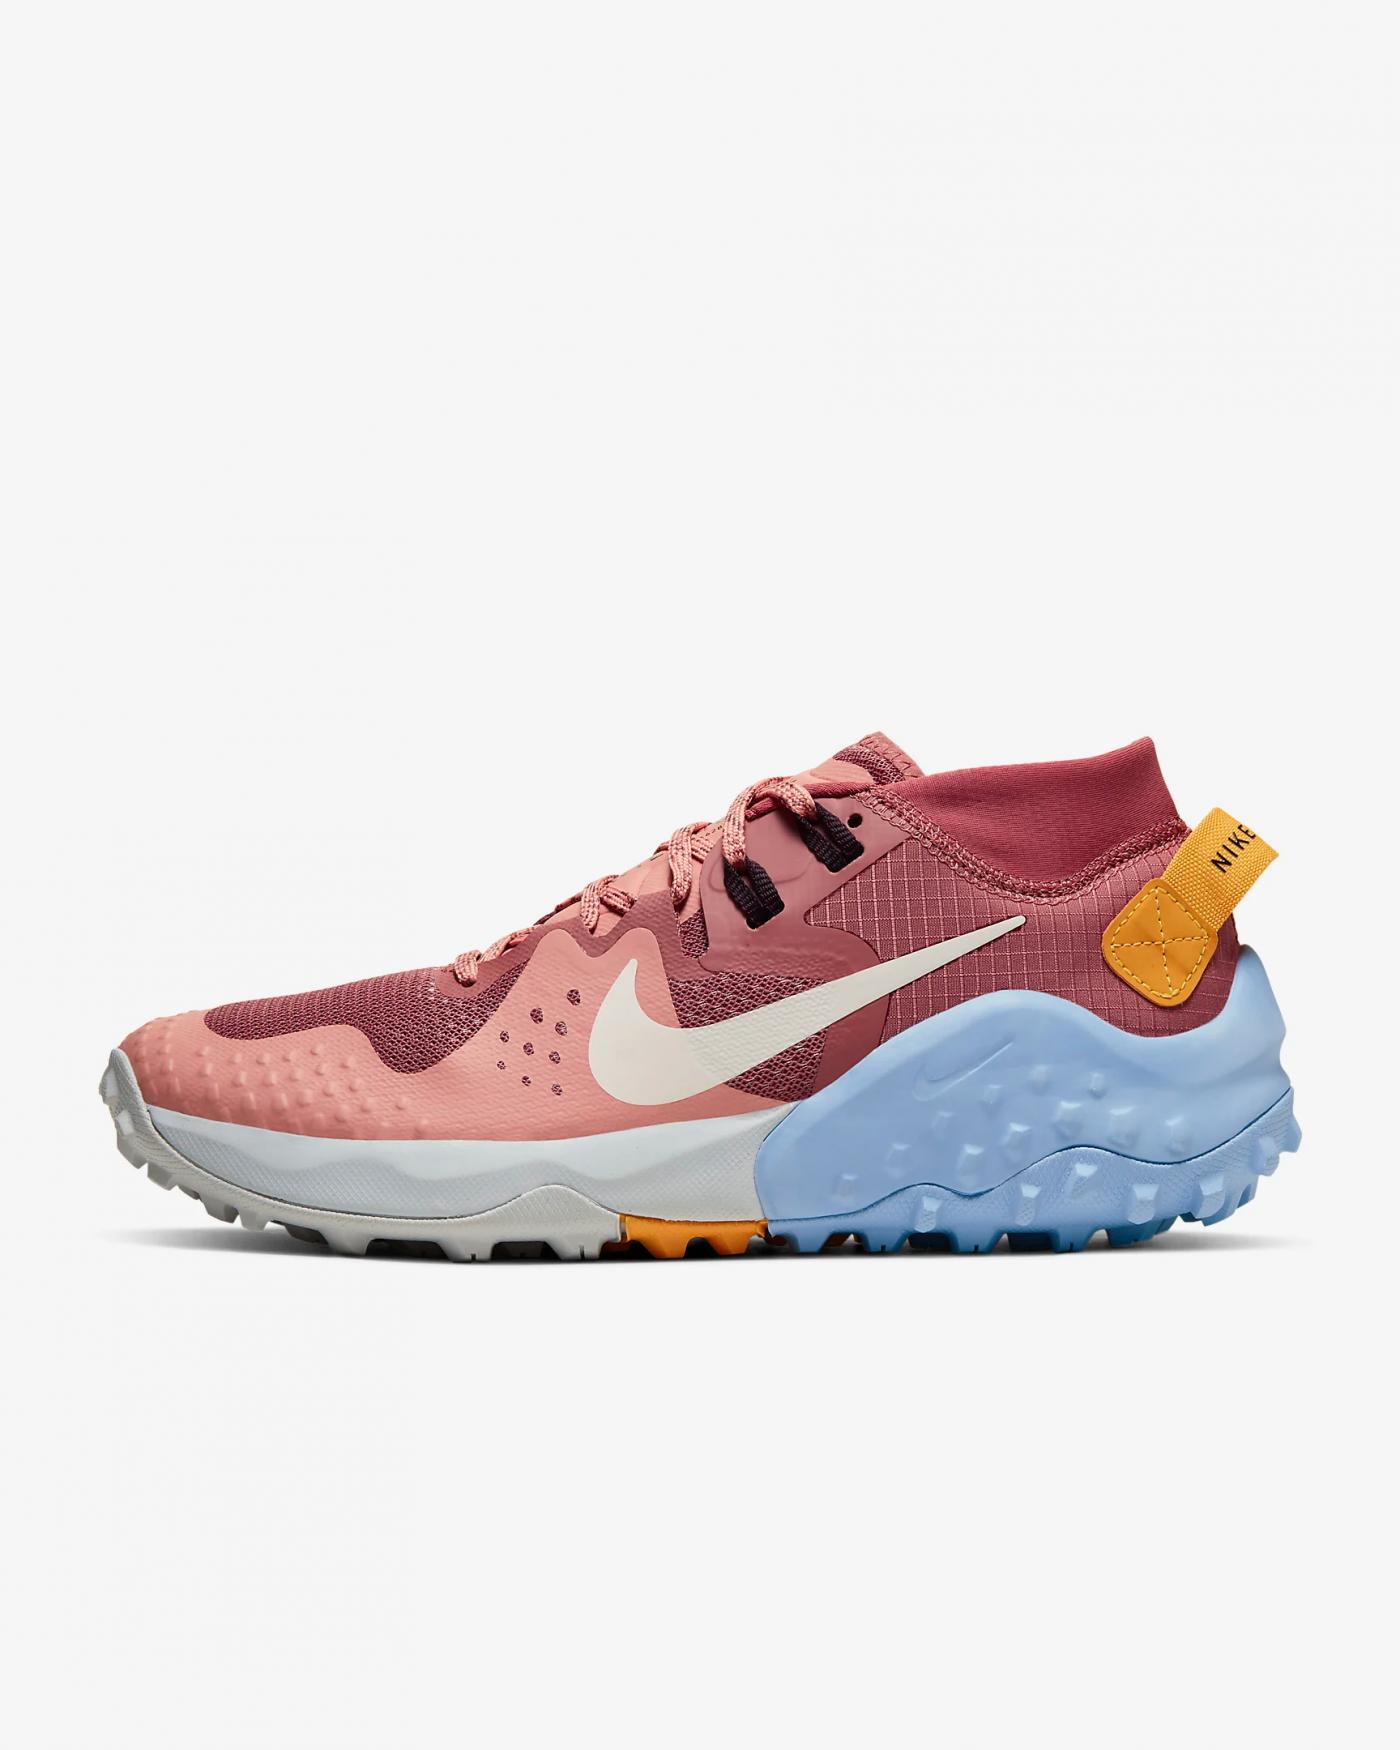 Nike-wildhorse-6-trail-femme-quartz-1